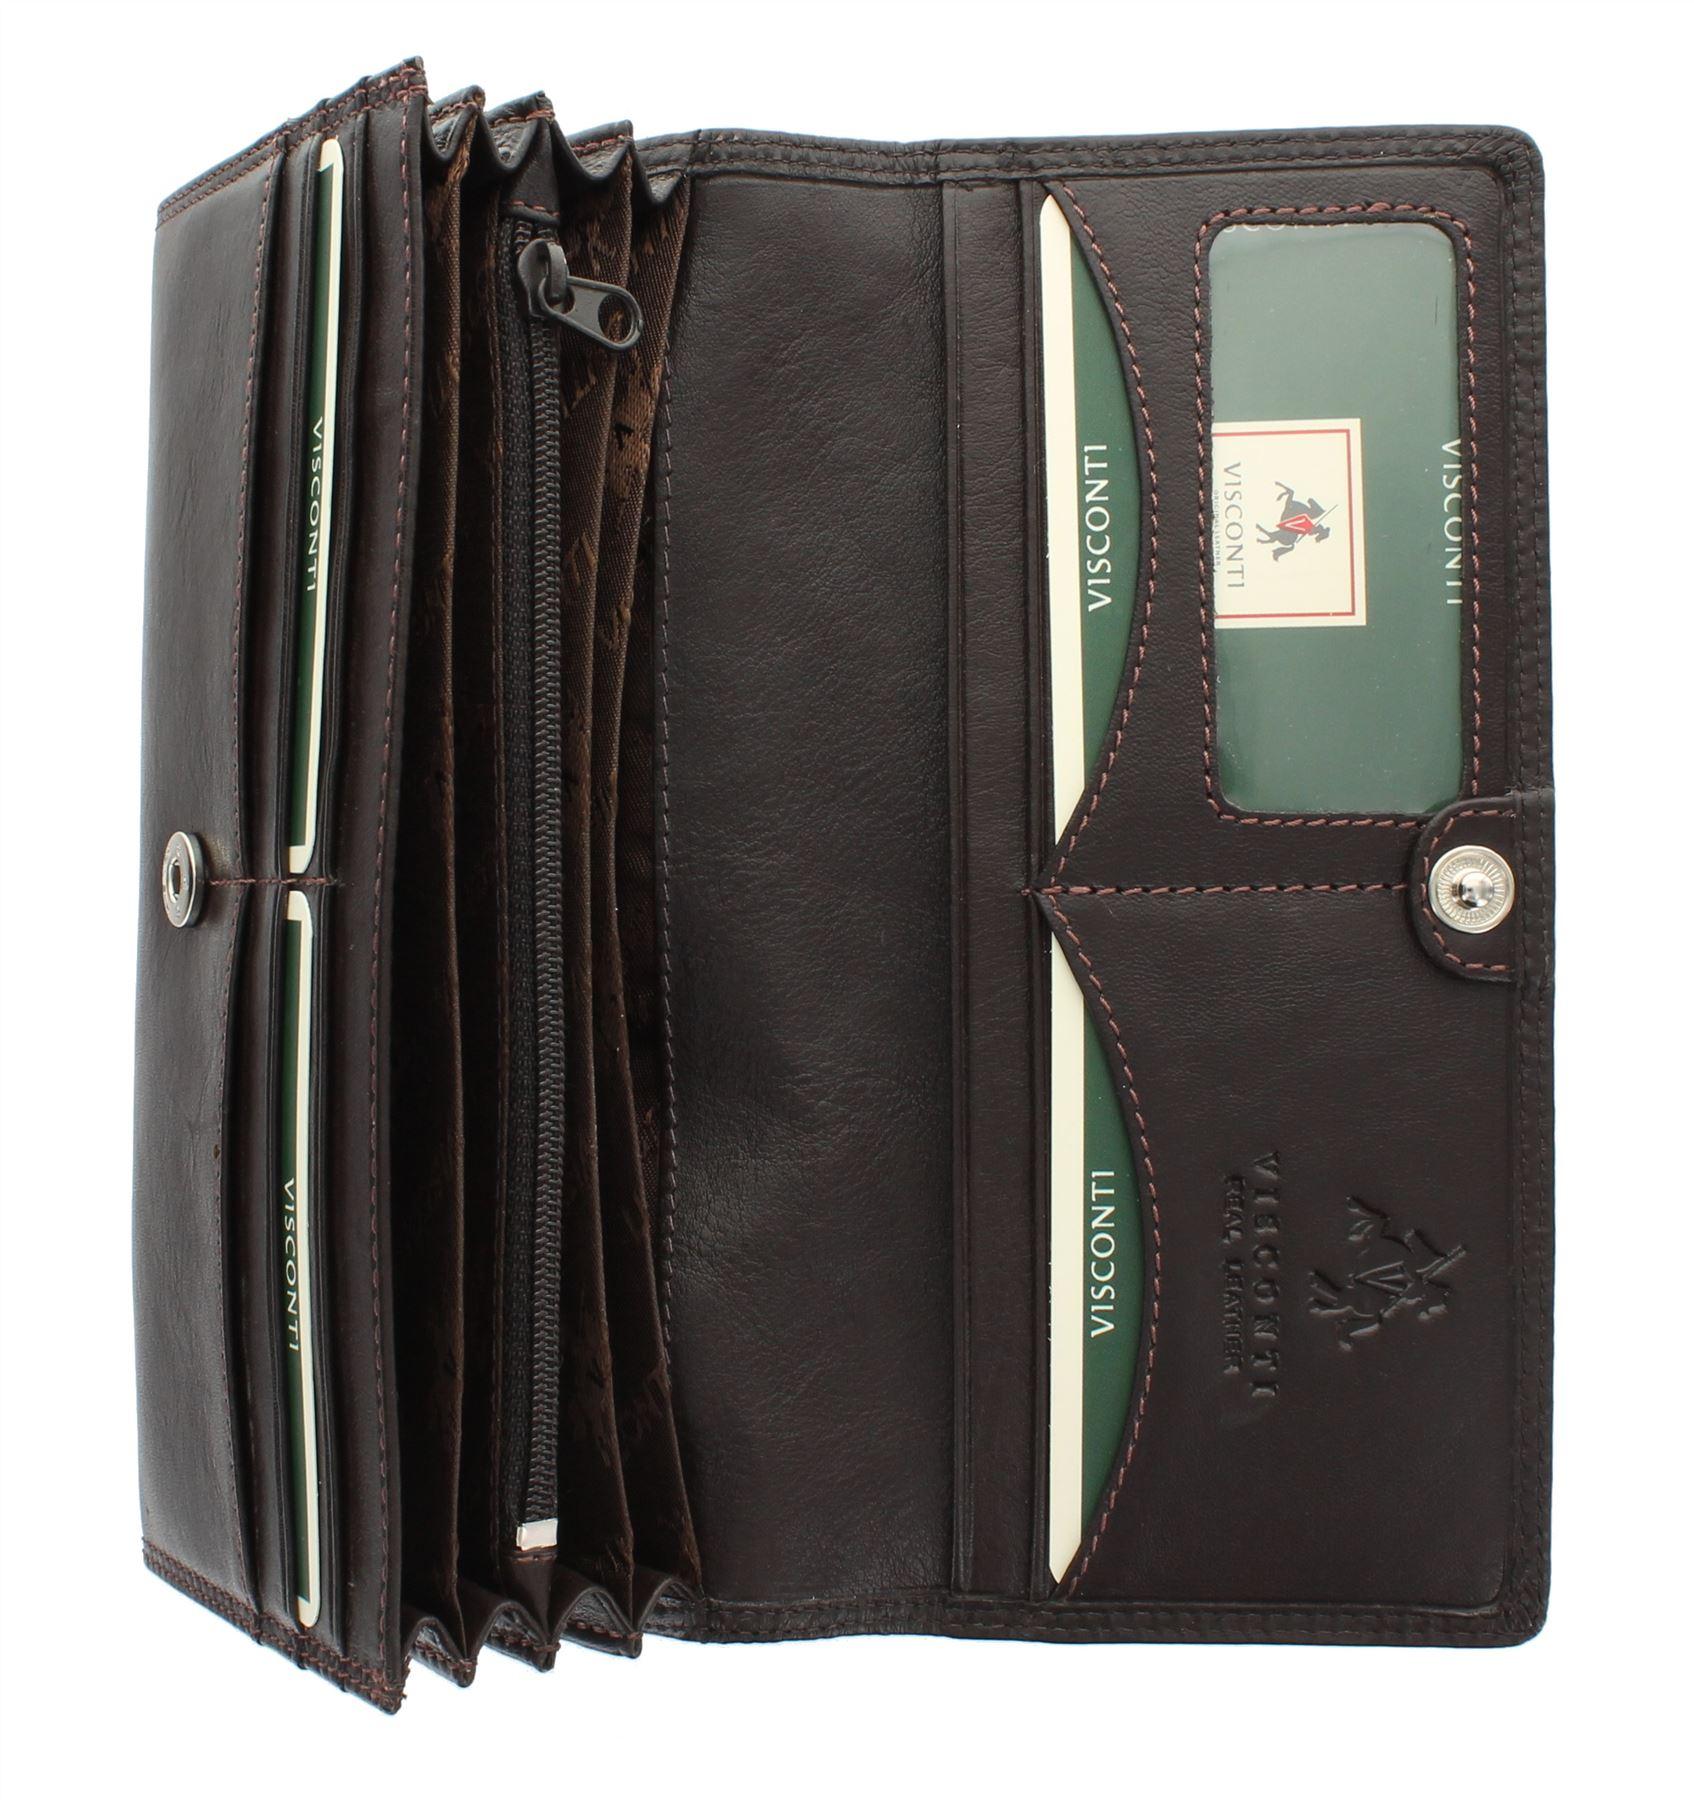 Visconti Heritage Collection BUCKINGHAM Leather Purse HT35 RFID blocking